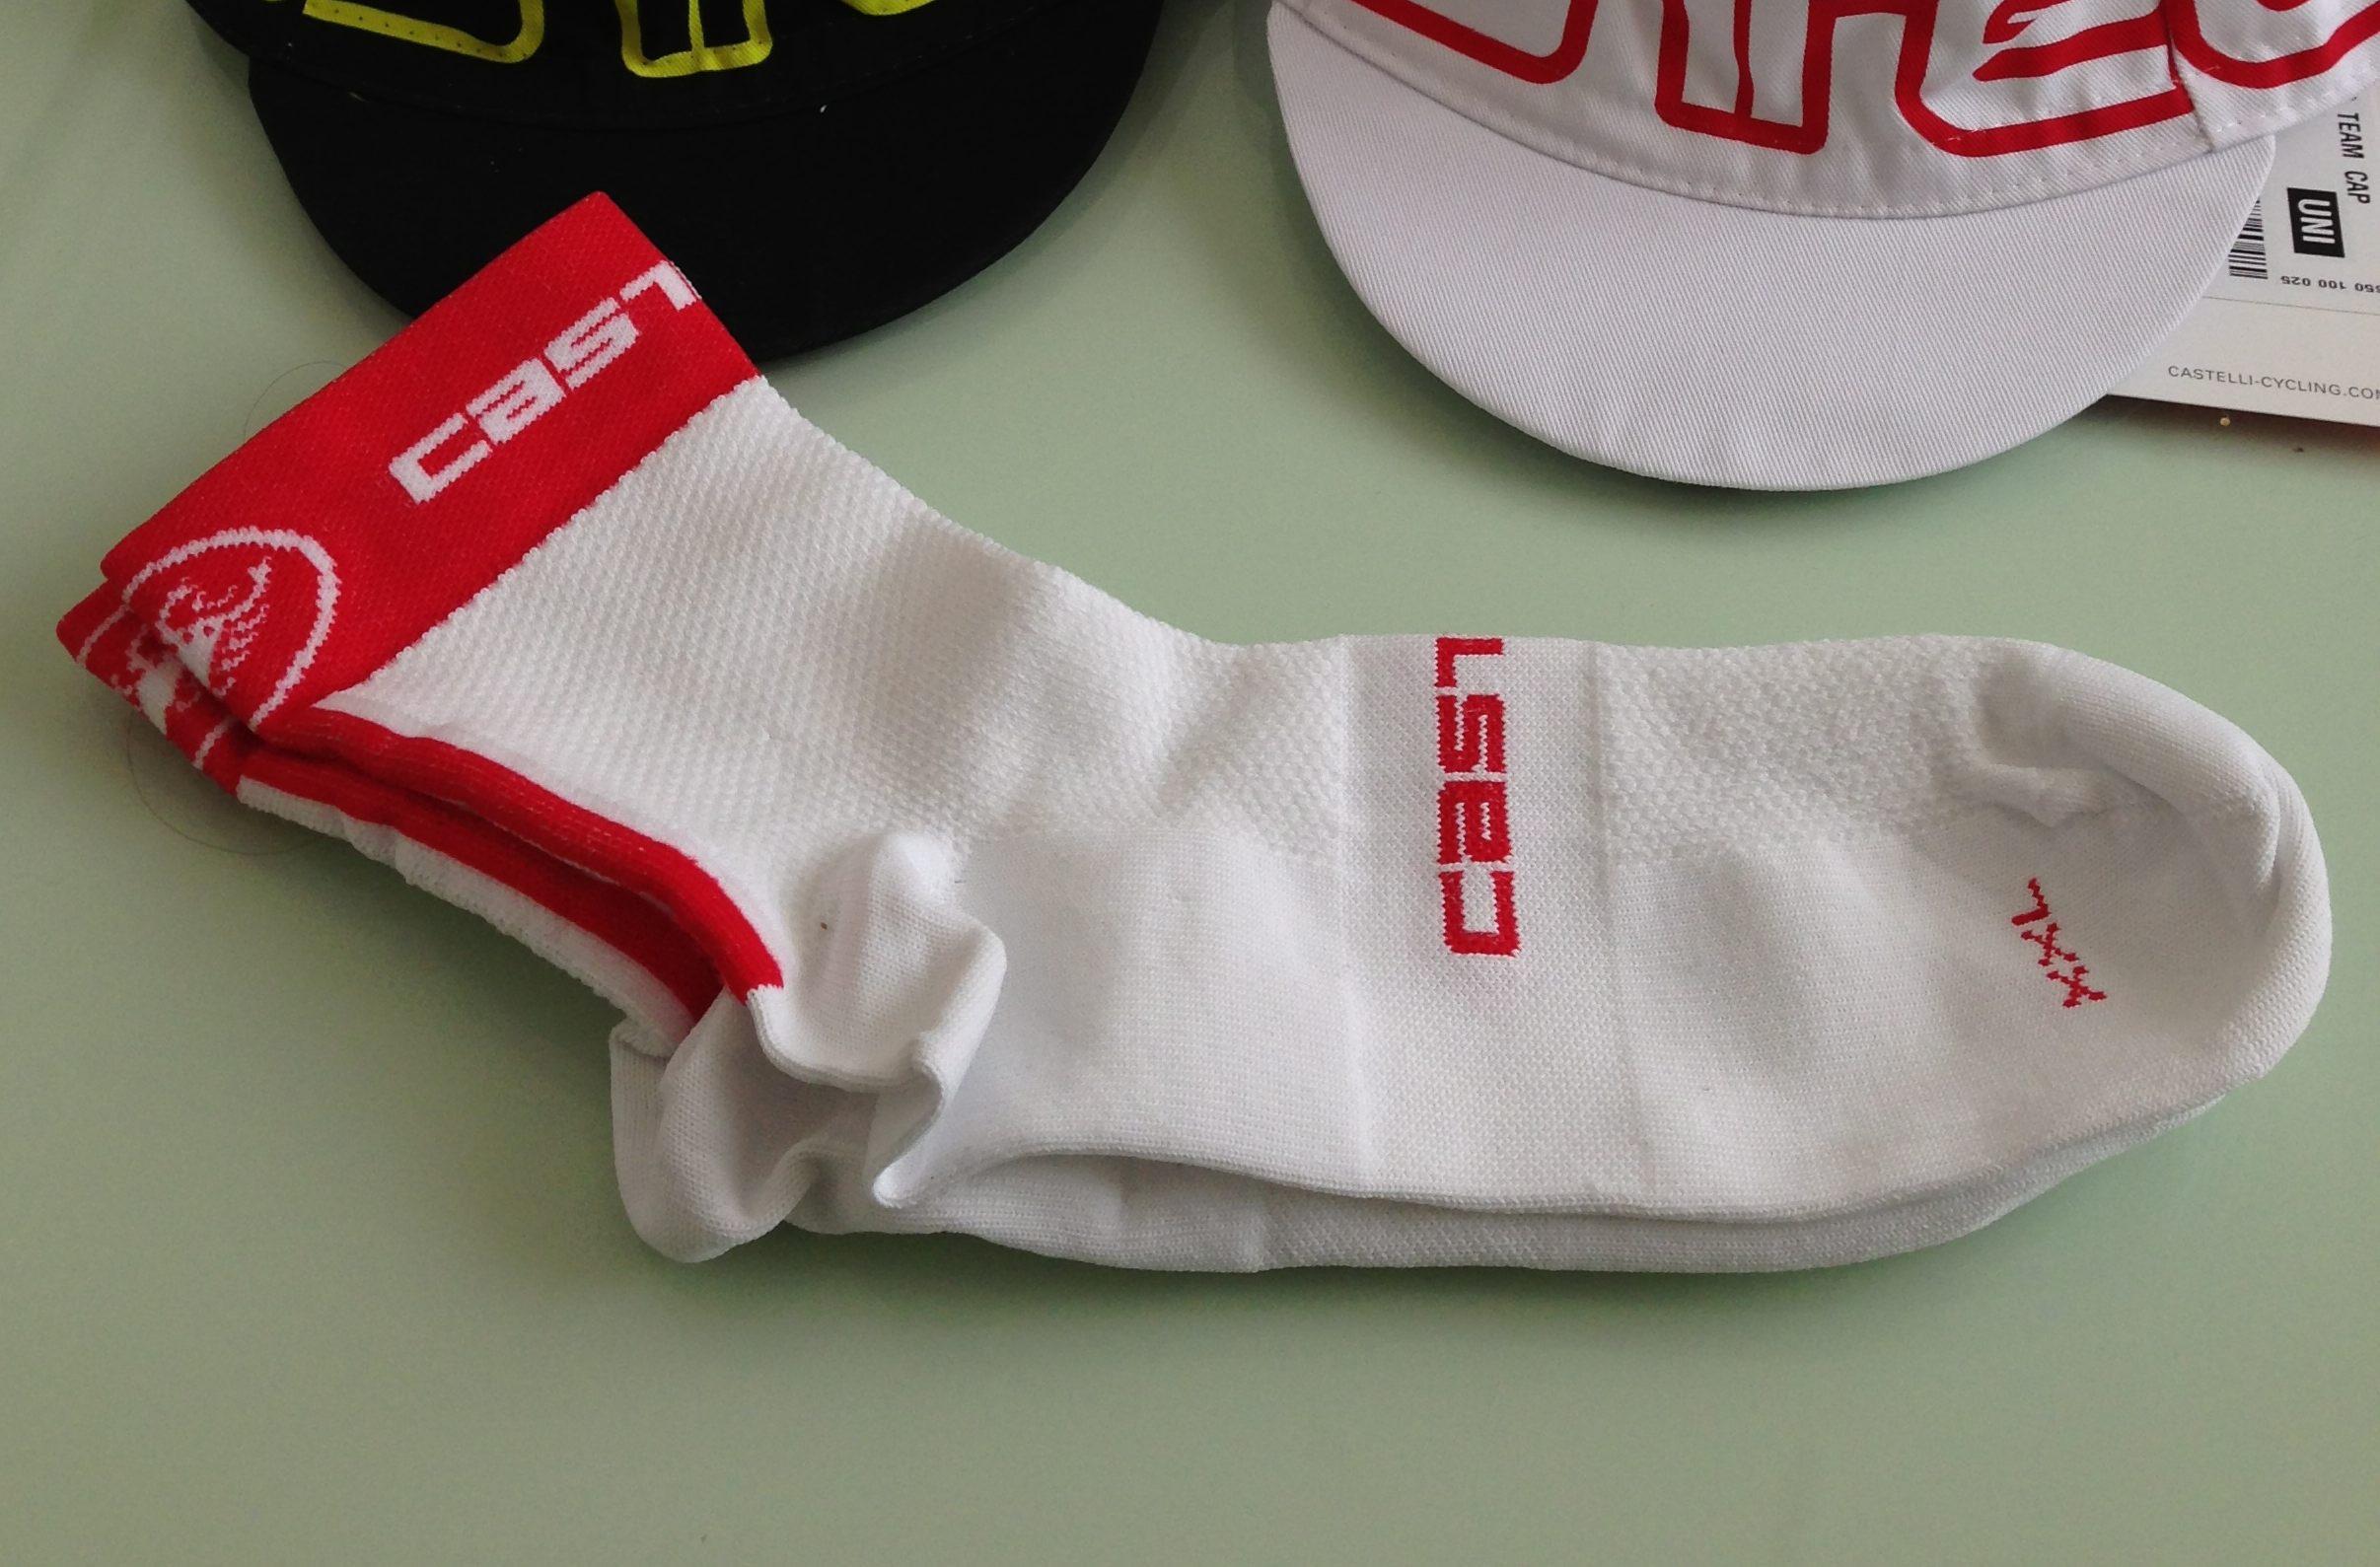 Calcetines Castelli mod. Free & Rosso Corsa